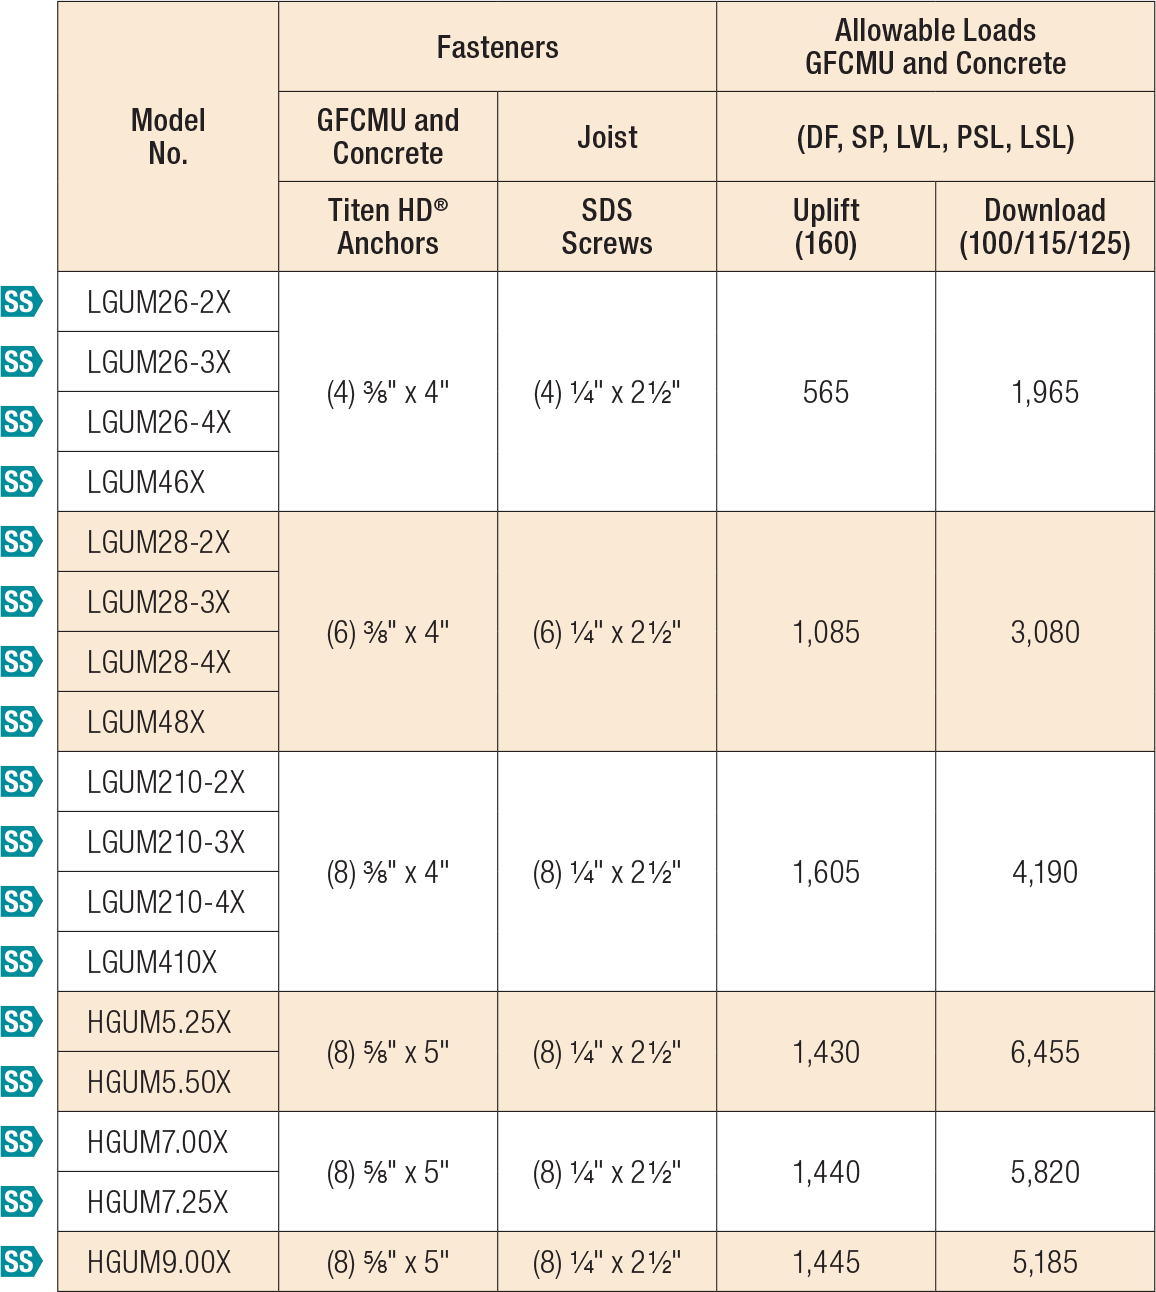 LGUM/HGUM Allowable Loads for Skewed (L/R) Applications